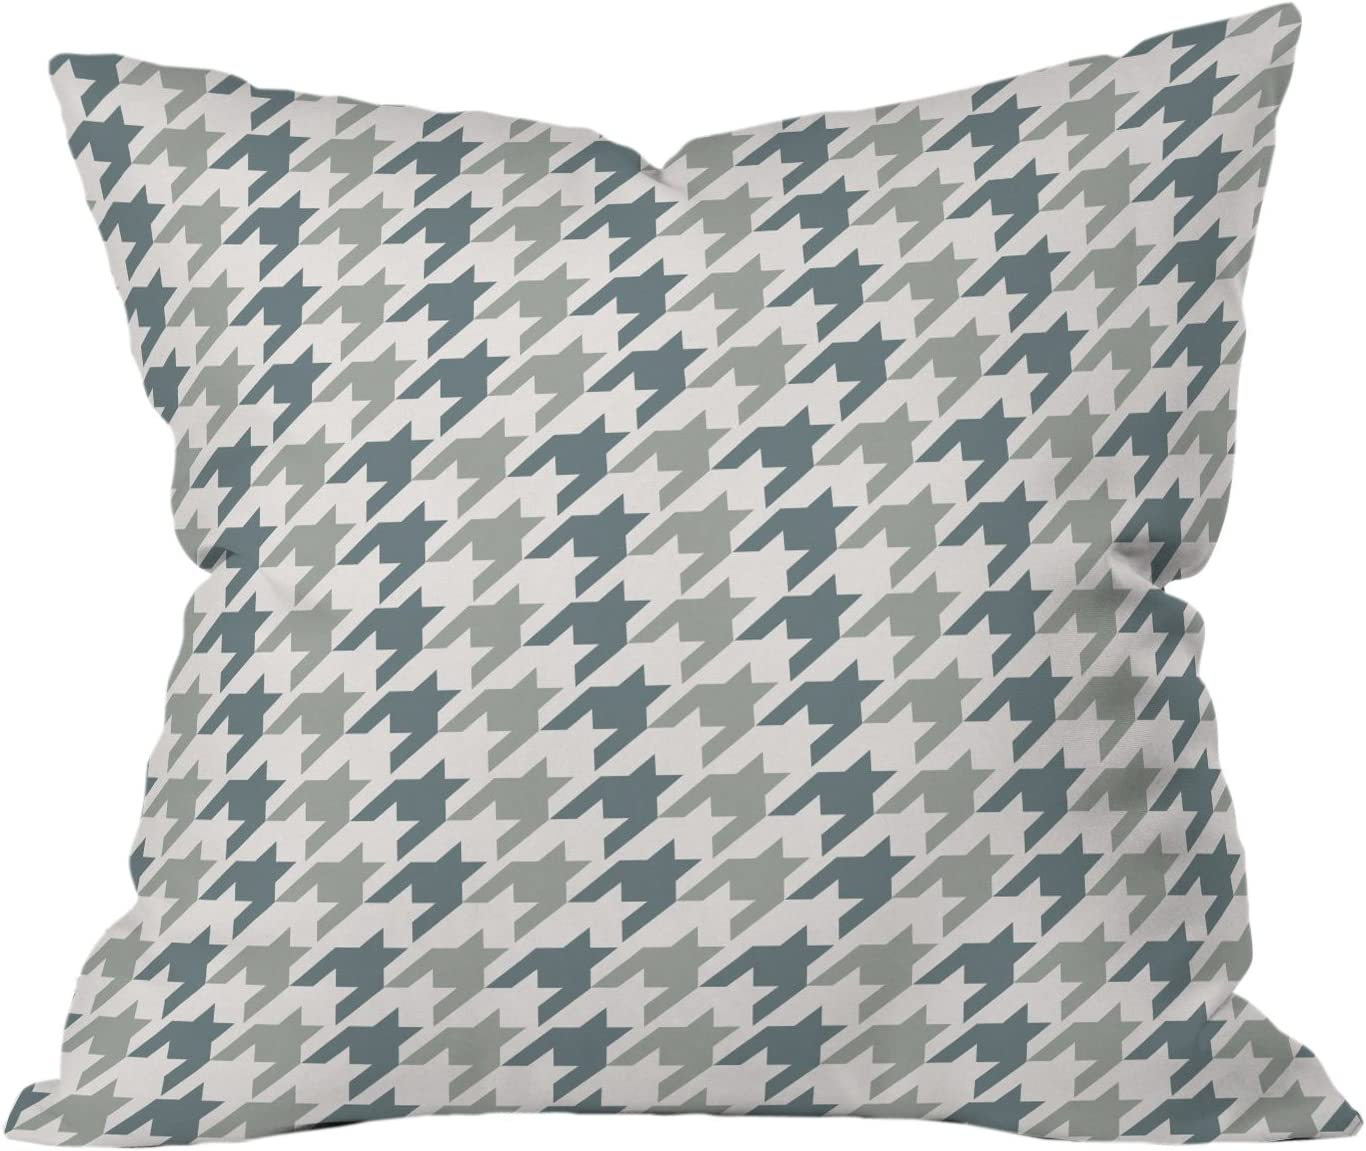 Amazon Com Deny Designs Allyson Johnson Classy Blue Houndstooth Throw Pillow 20 X 20 Home Kitchen